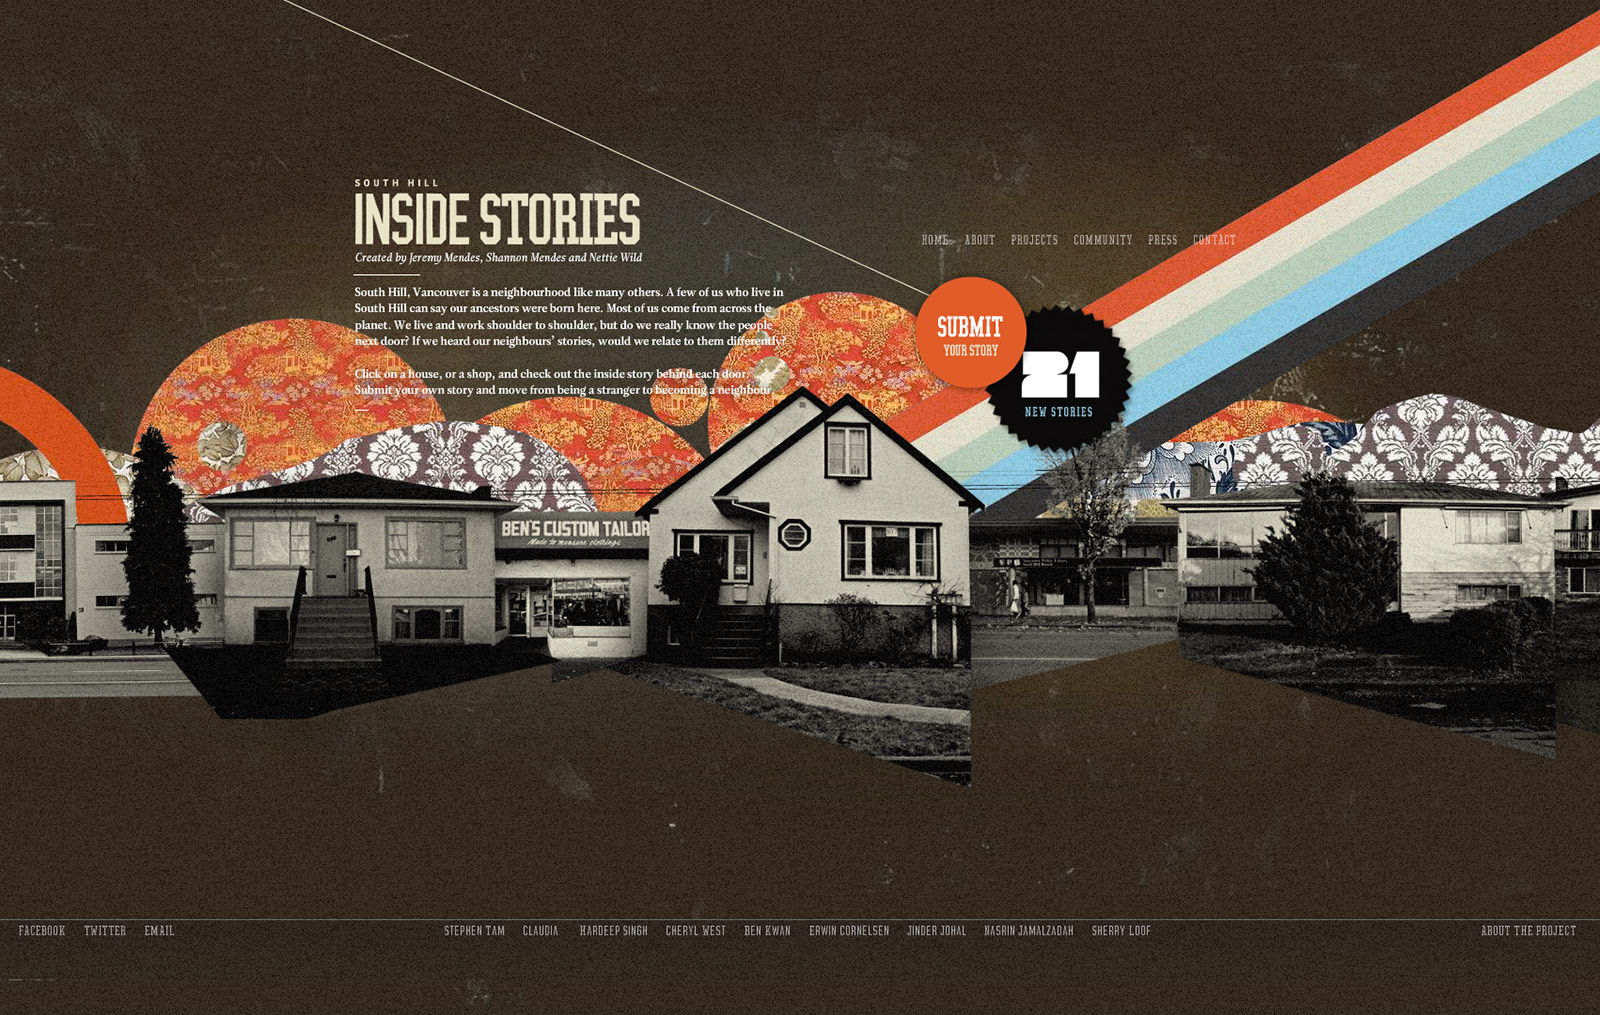 Insidestories-opener.jpg